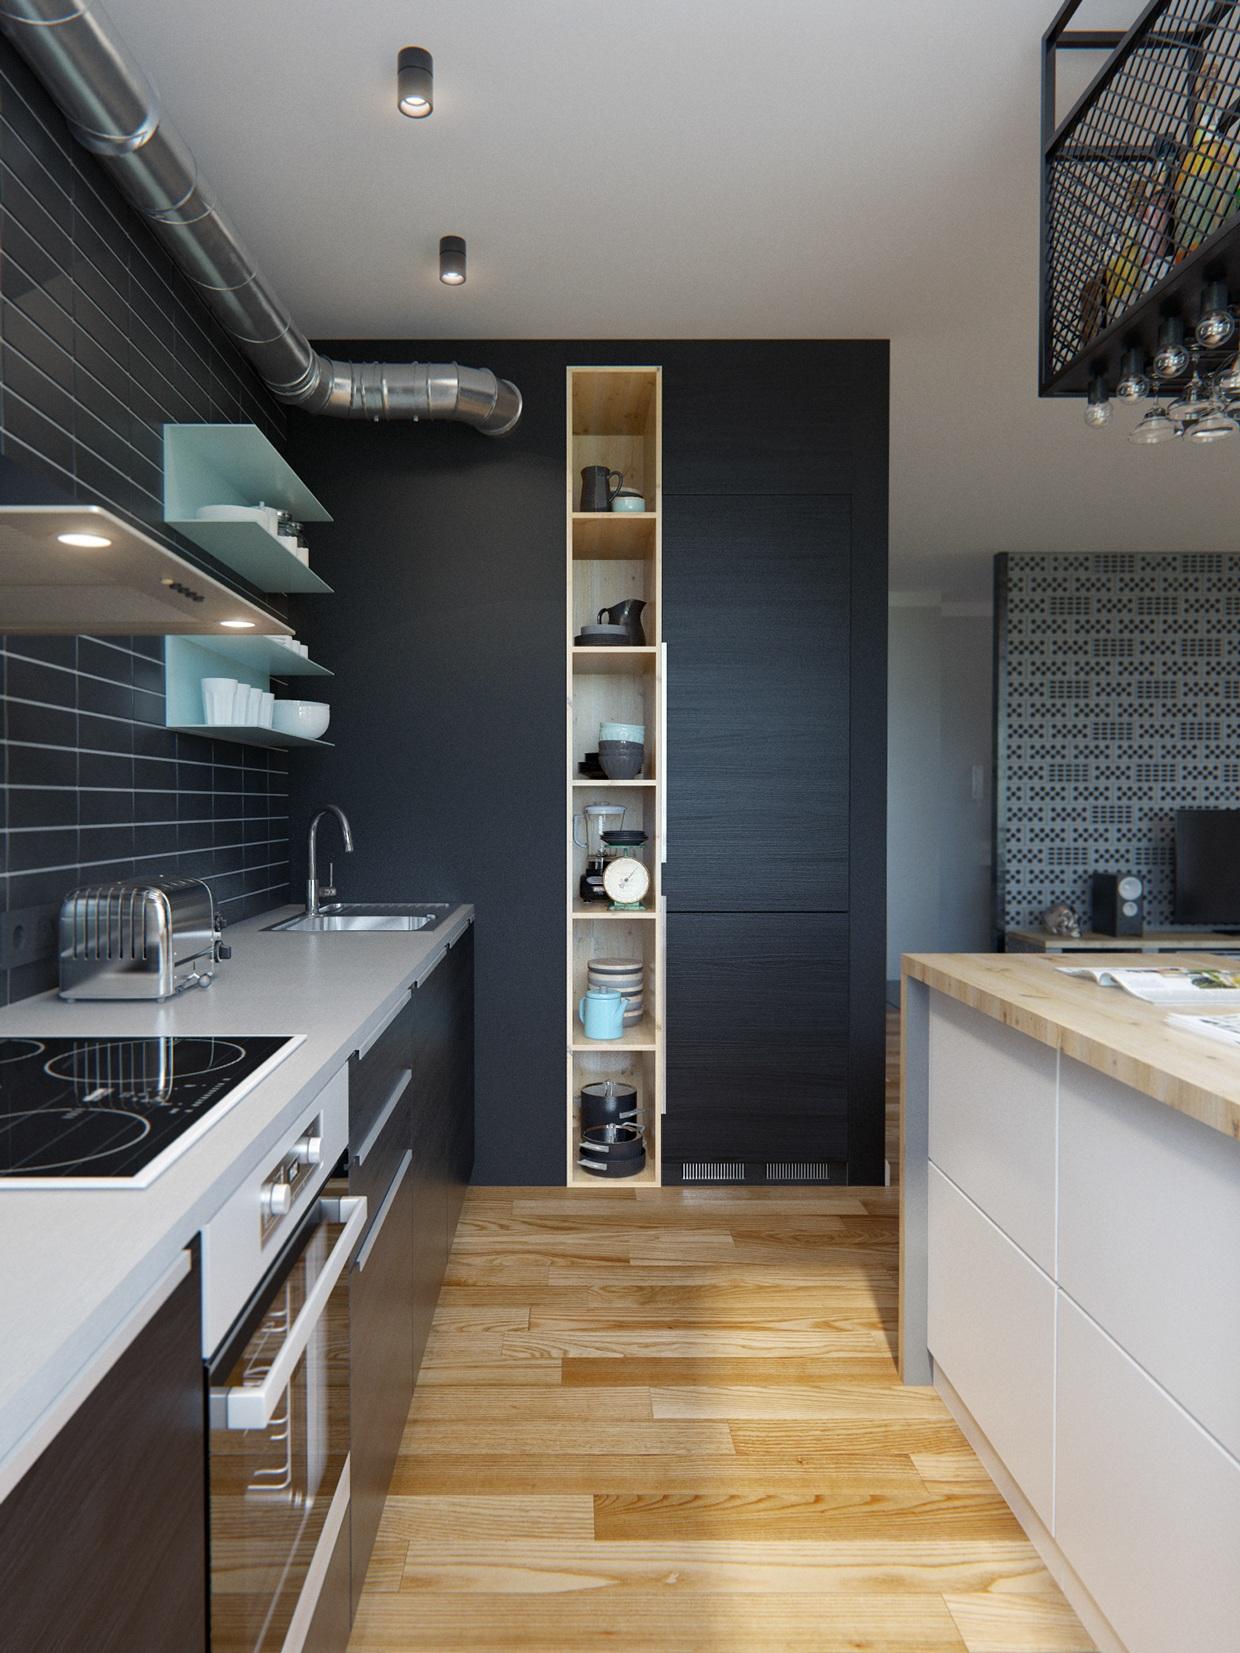 Casabook immobiliare: febbraio 2015